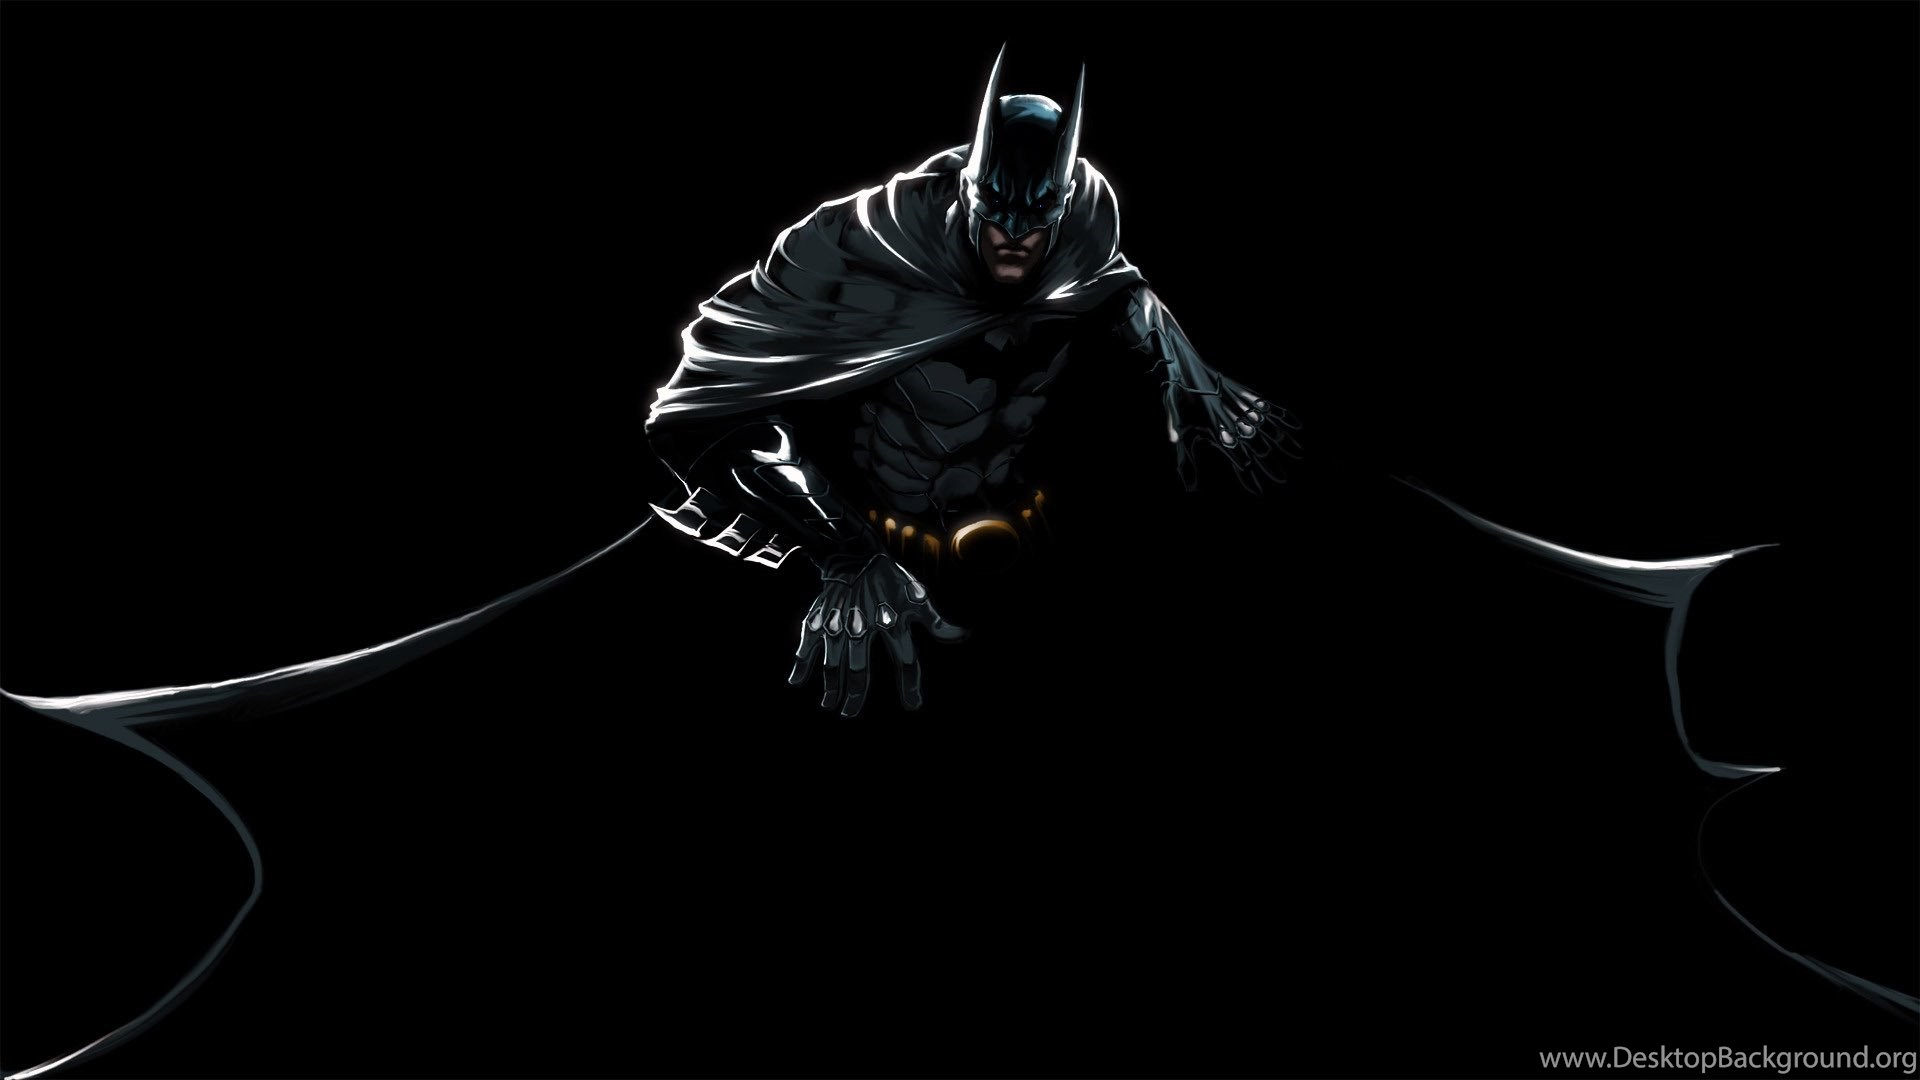 Batman Hd Wallpapers Batman Images Free Cool Wallpapers Petpictures